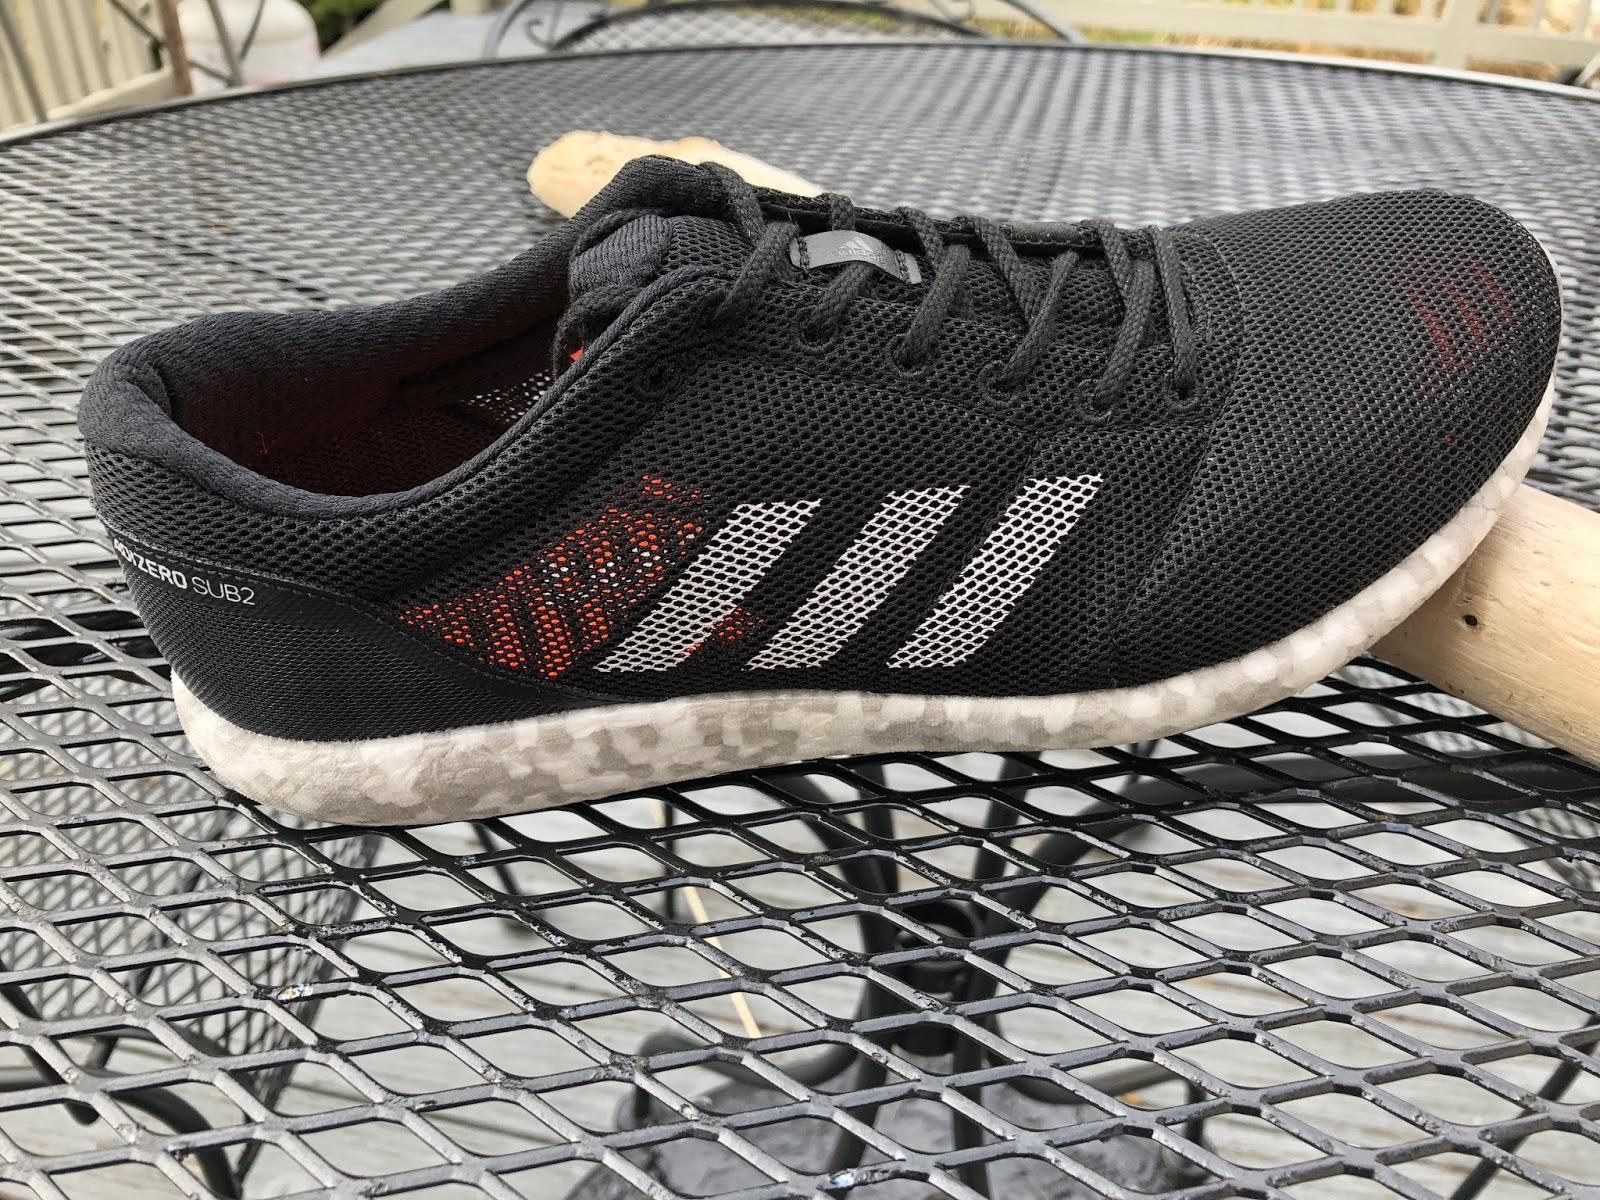 romántico Tradicion bala  Road Trail Run: In Depth Adidas Adizero Sub2 Multi Tester Review: Highly  Engineered yet Simple, Sleek, Light and Elegant State of the Art